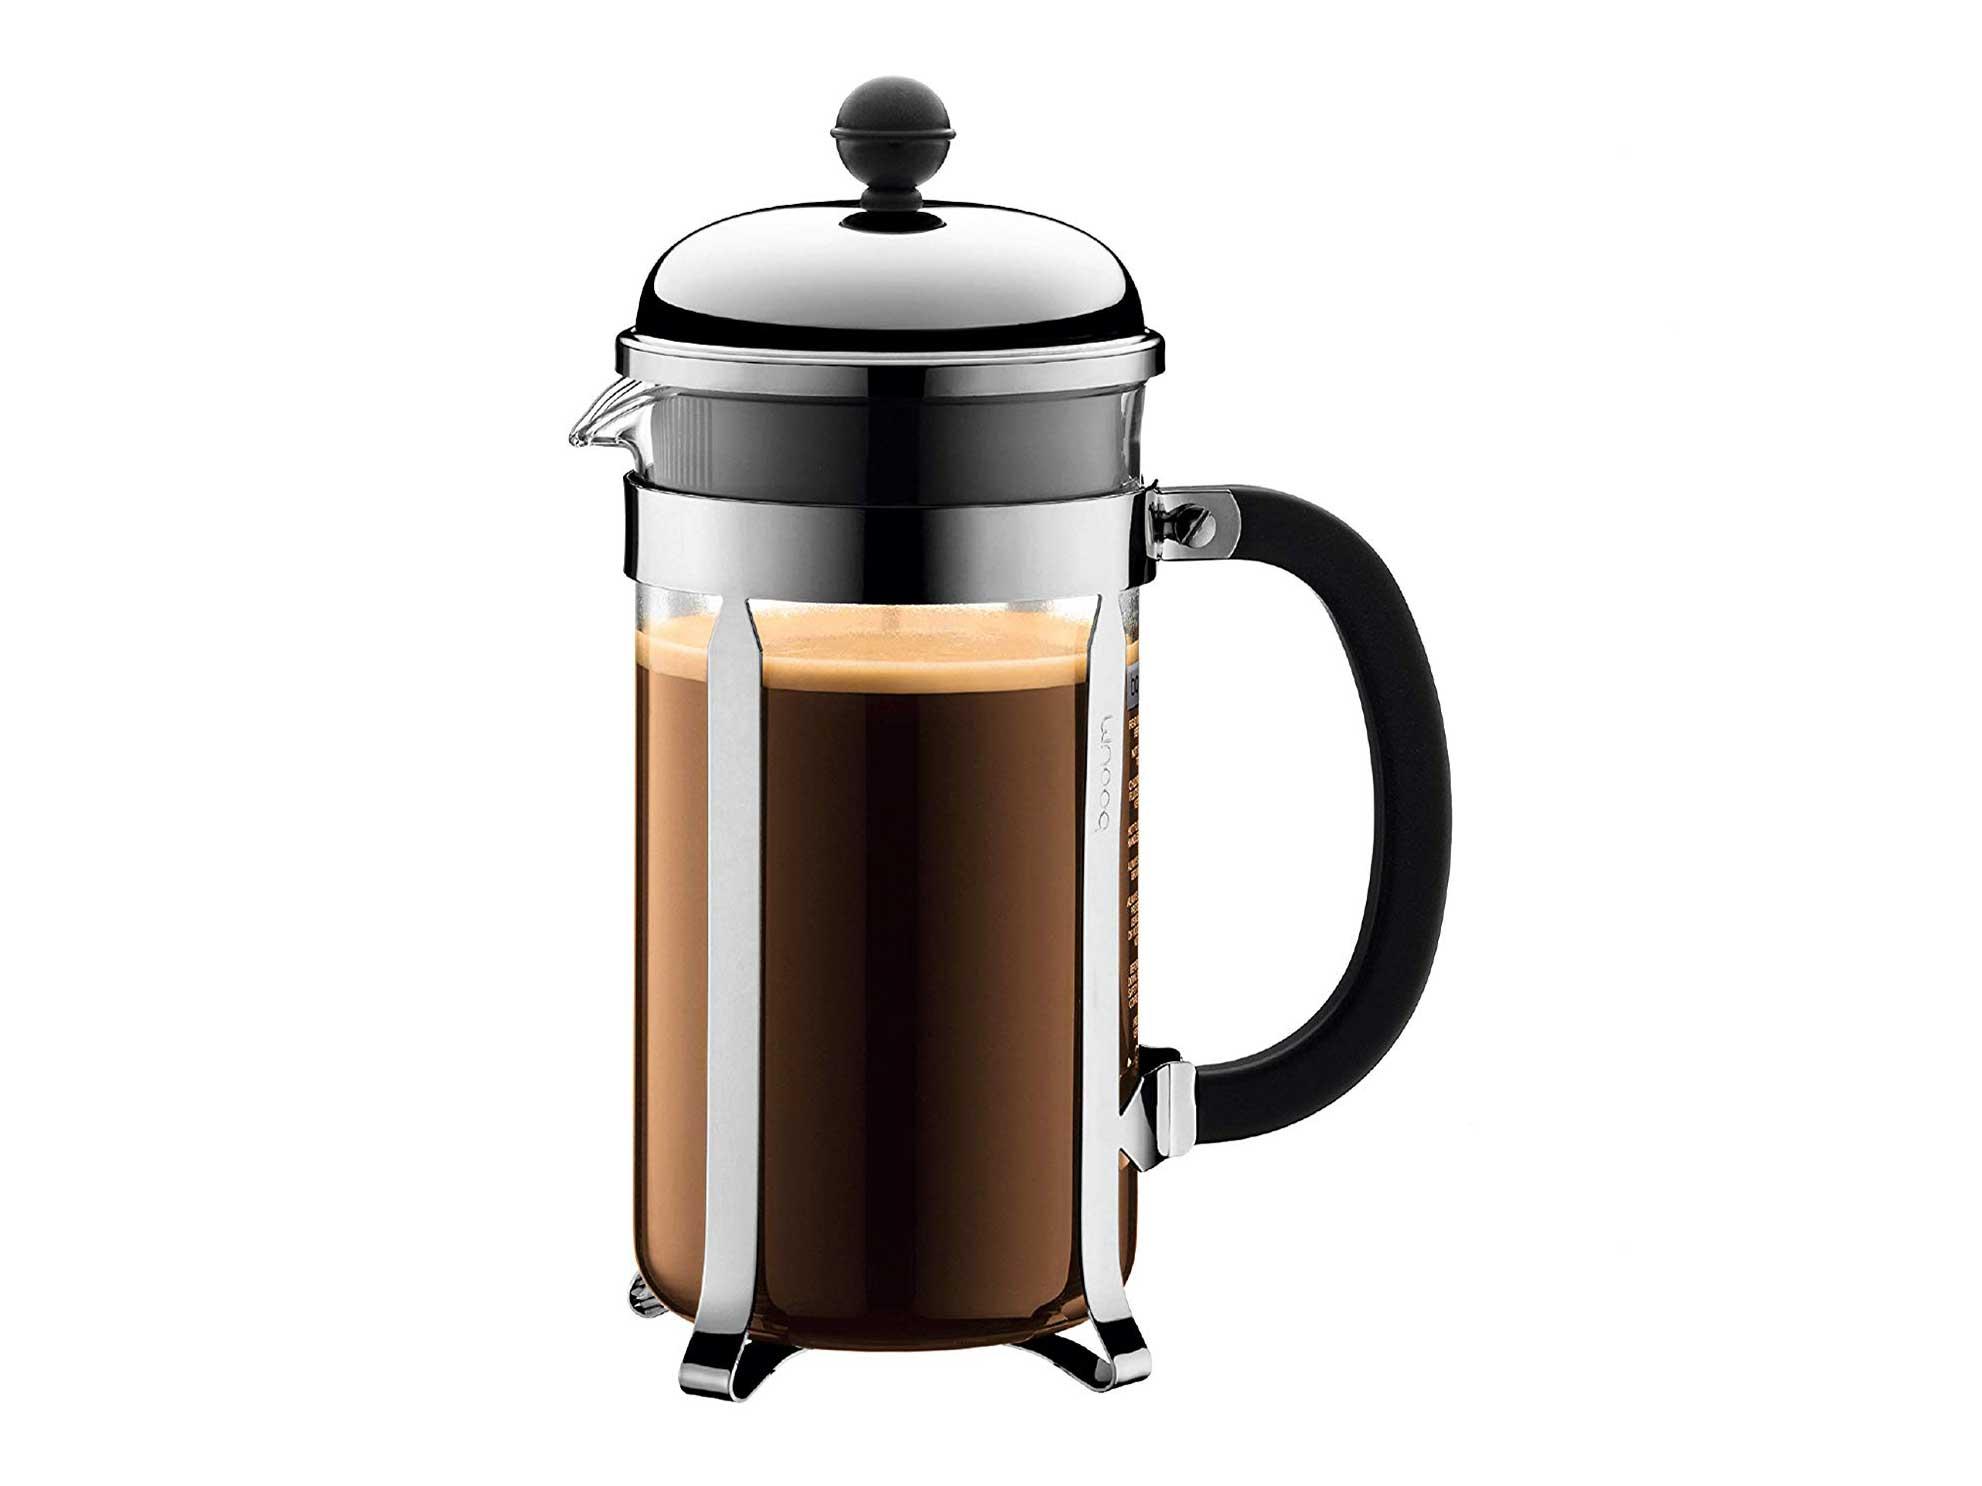 httpspush.saveur.comsitessaveur.comfilesimages201910bodum-chambord-french-press-coffee-maker.jpg